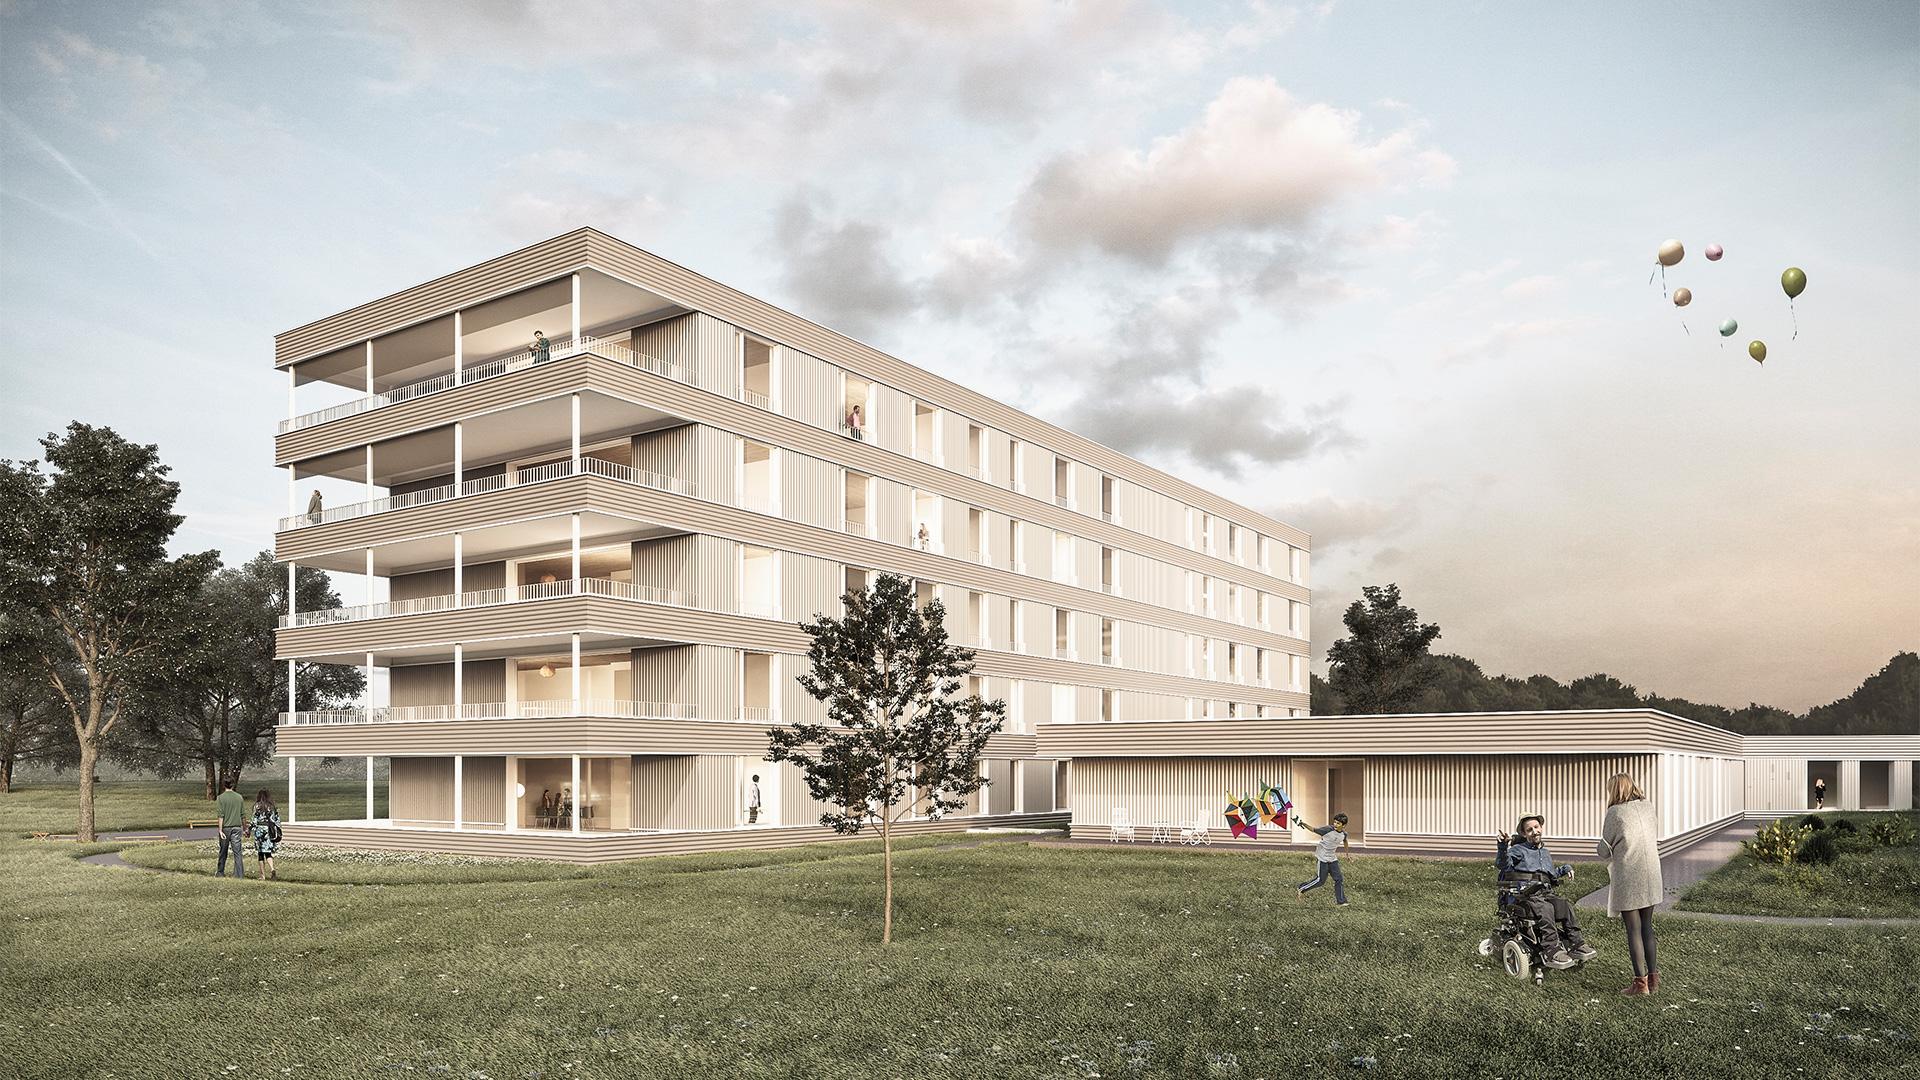 Neubau-Stiftung-Aarhus-Morgenstimmung.jpg